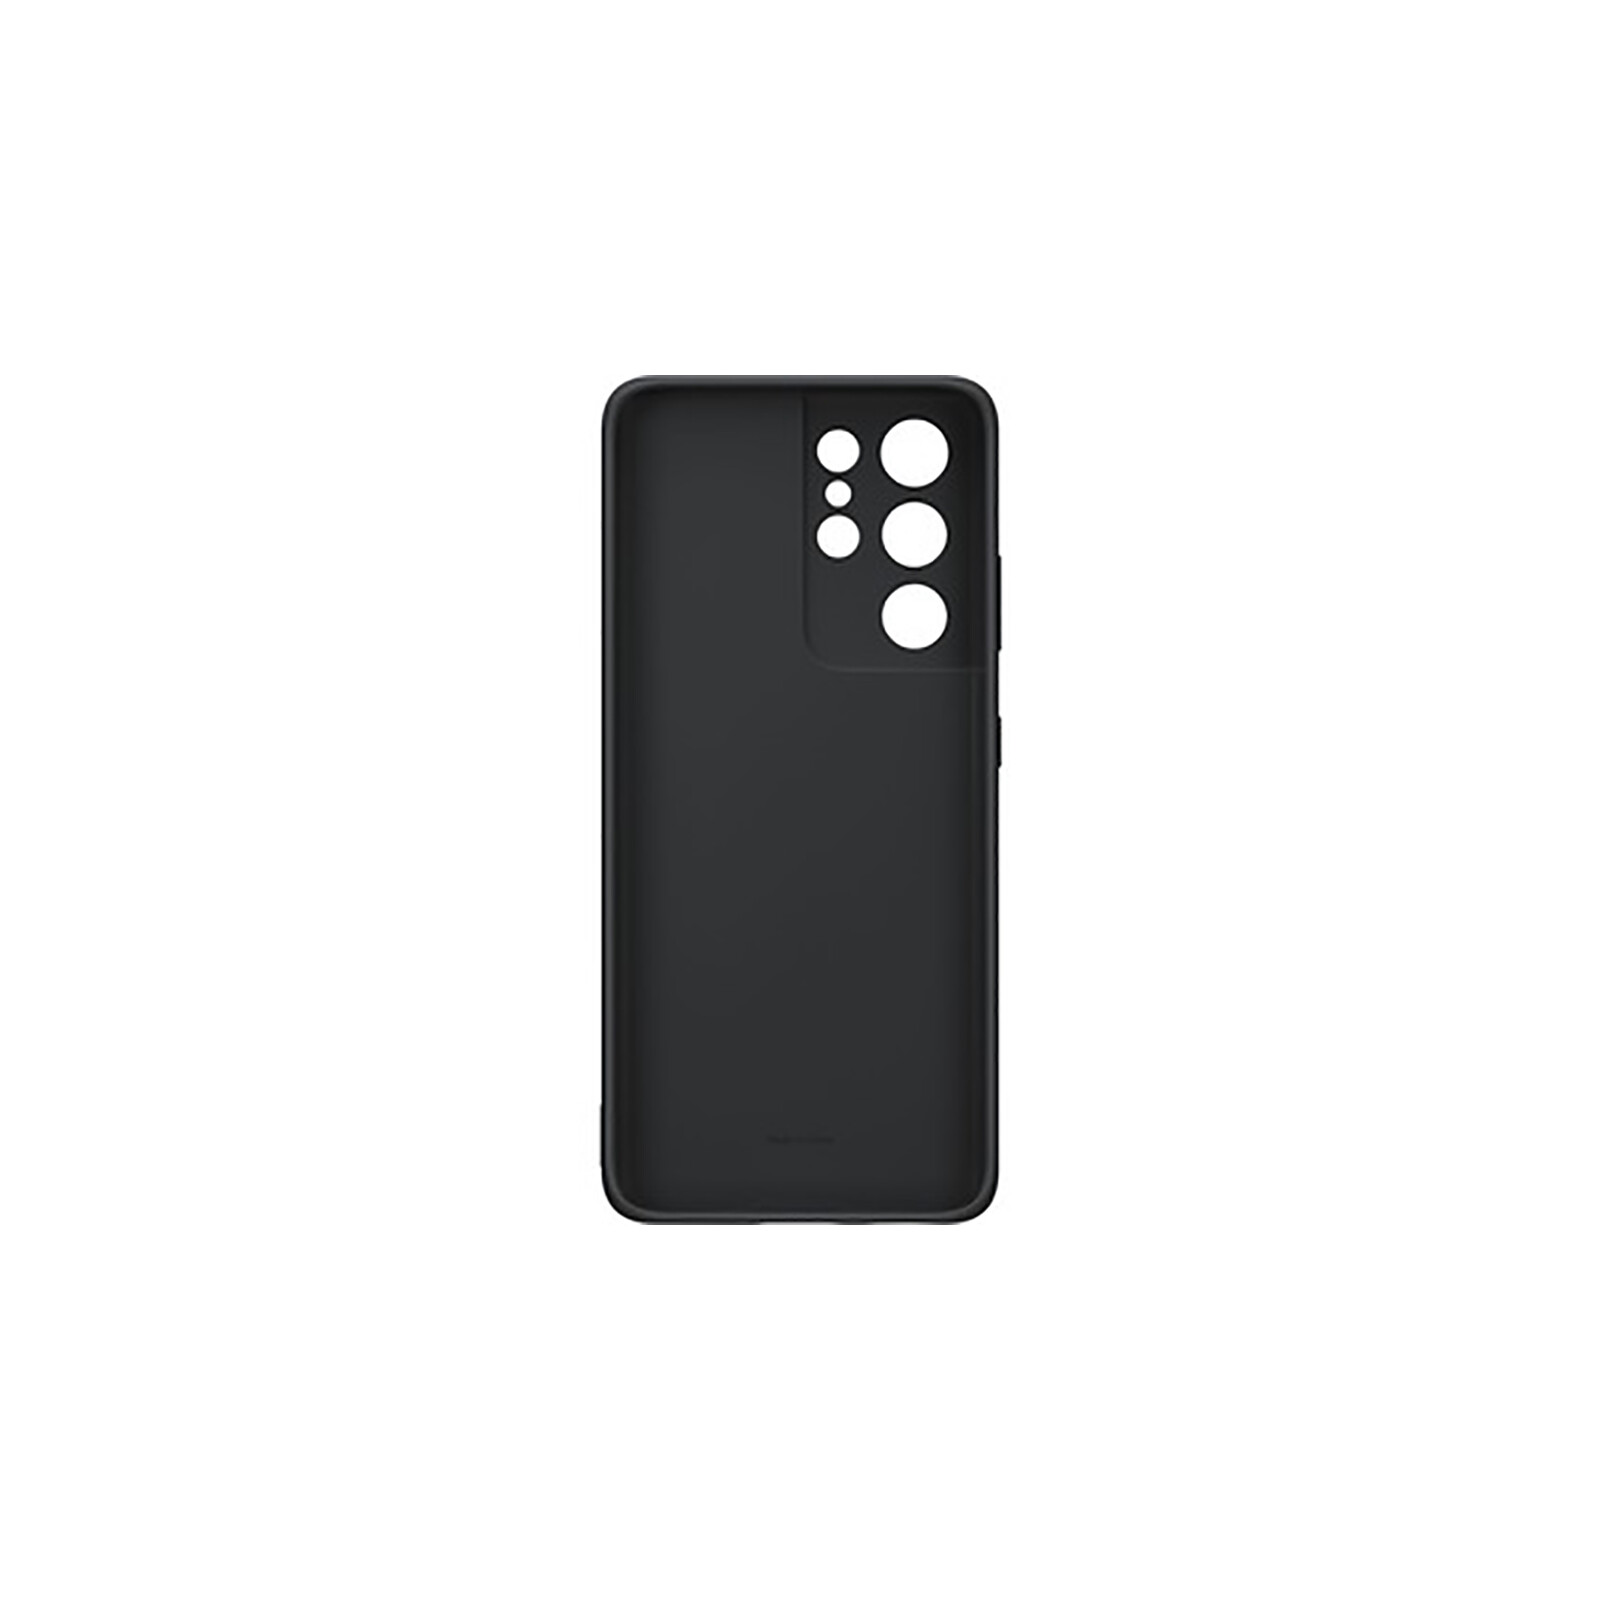 Samsung Back Cover Silicone Galaxy S21 Ultra black